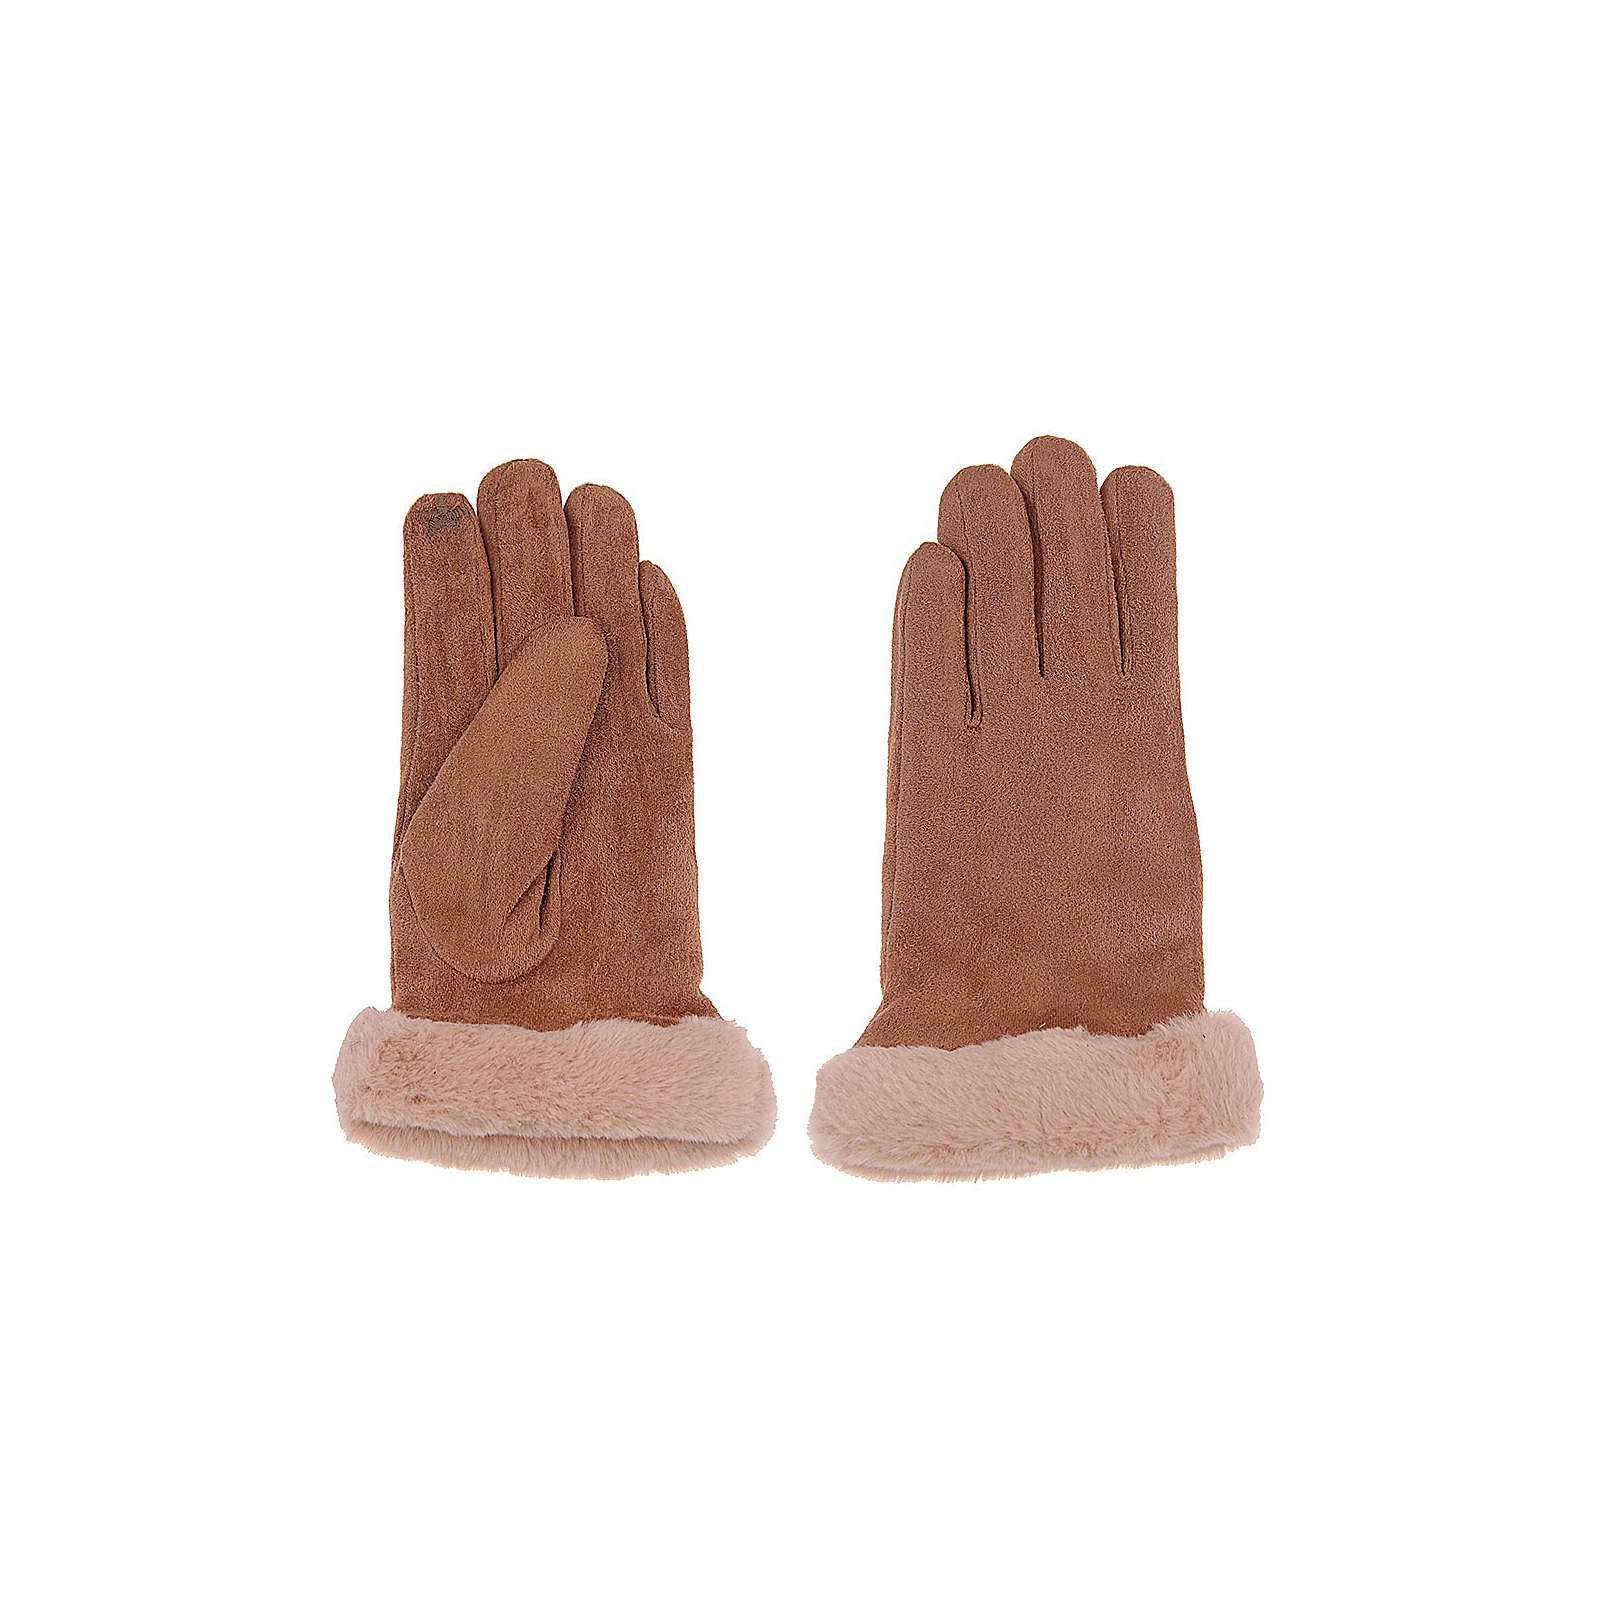 Leslii Fingerhandschuhe mit Kunstfell Fingerhandschuhe braun/beige Damen